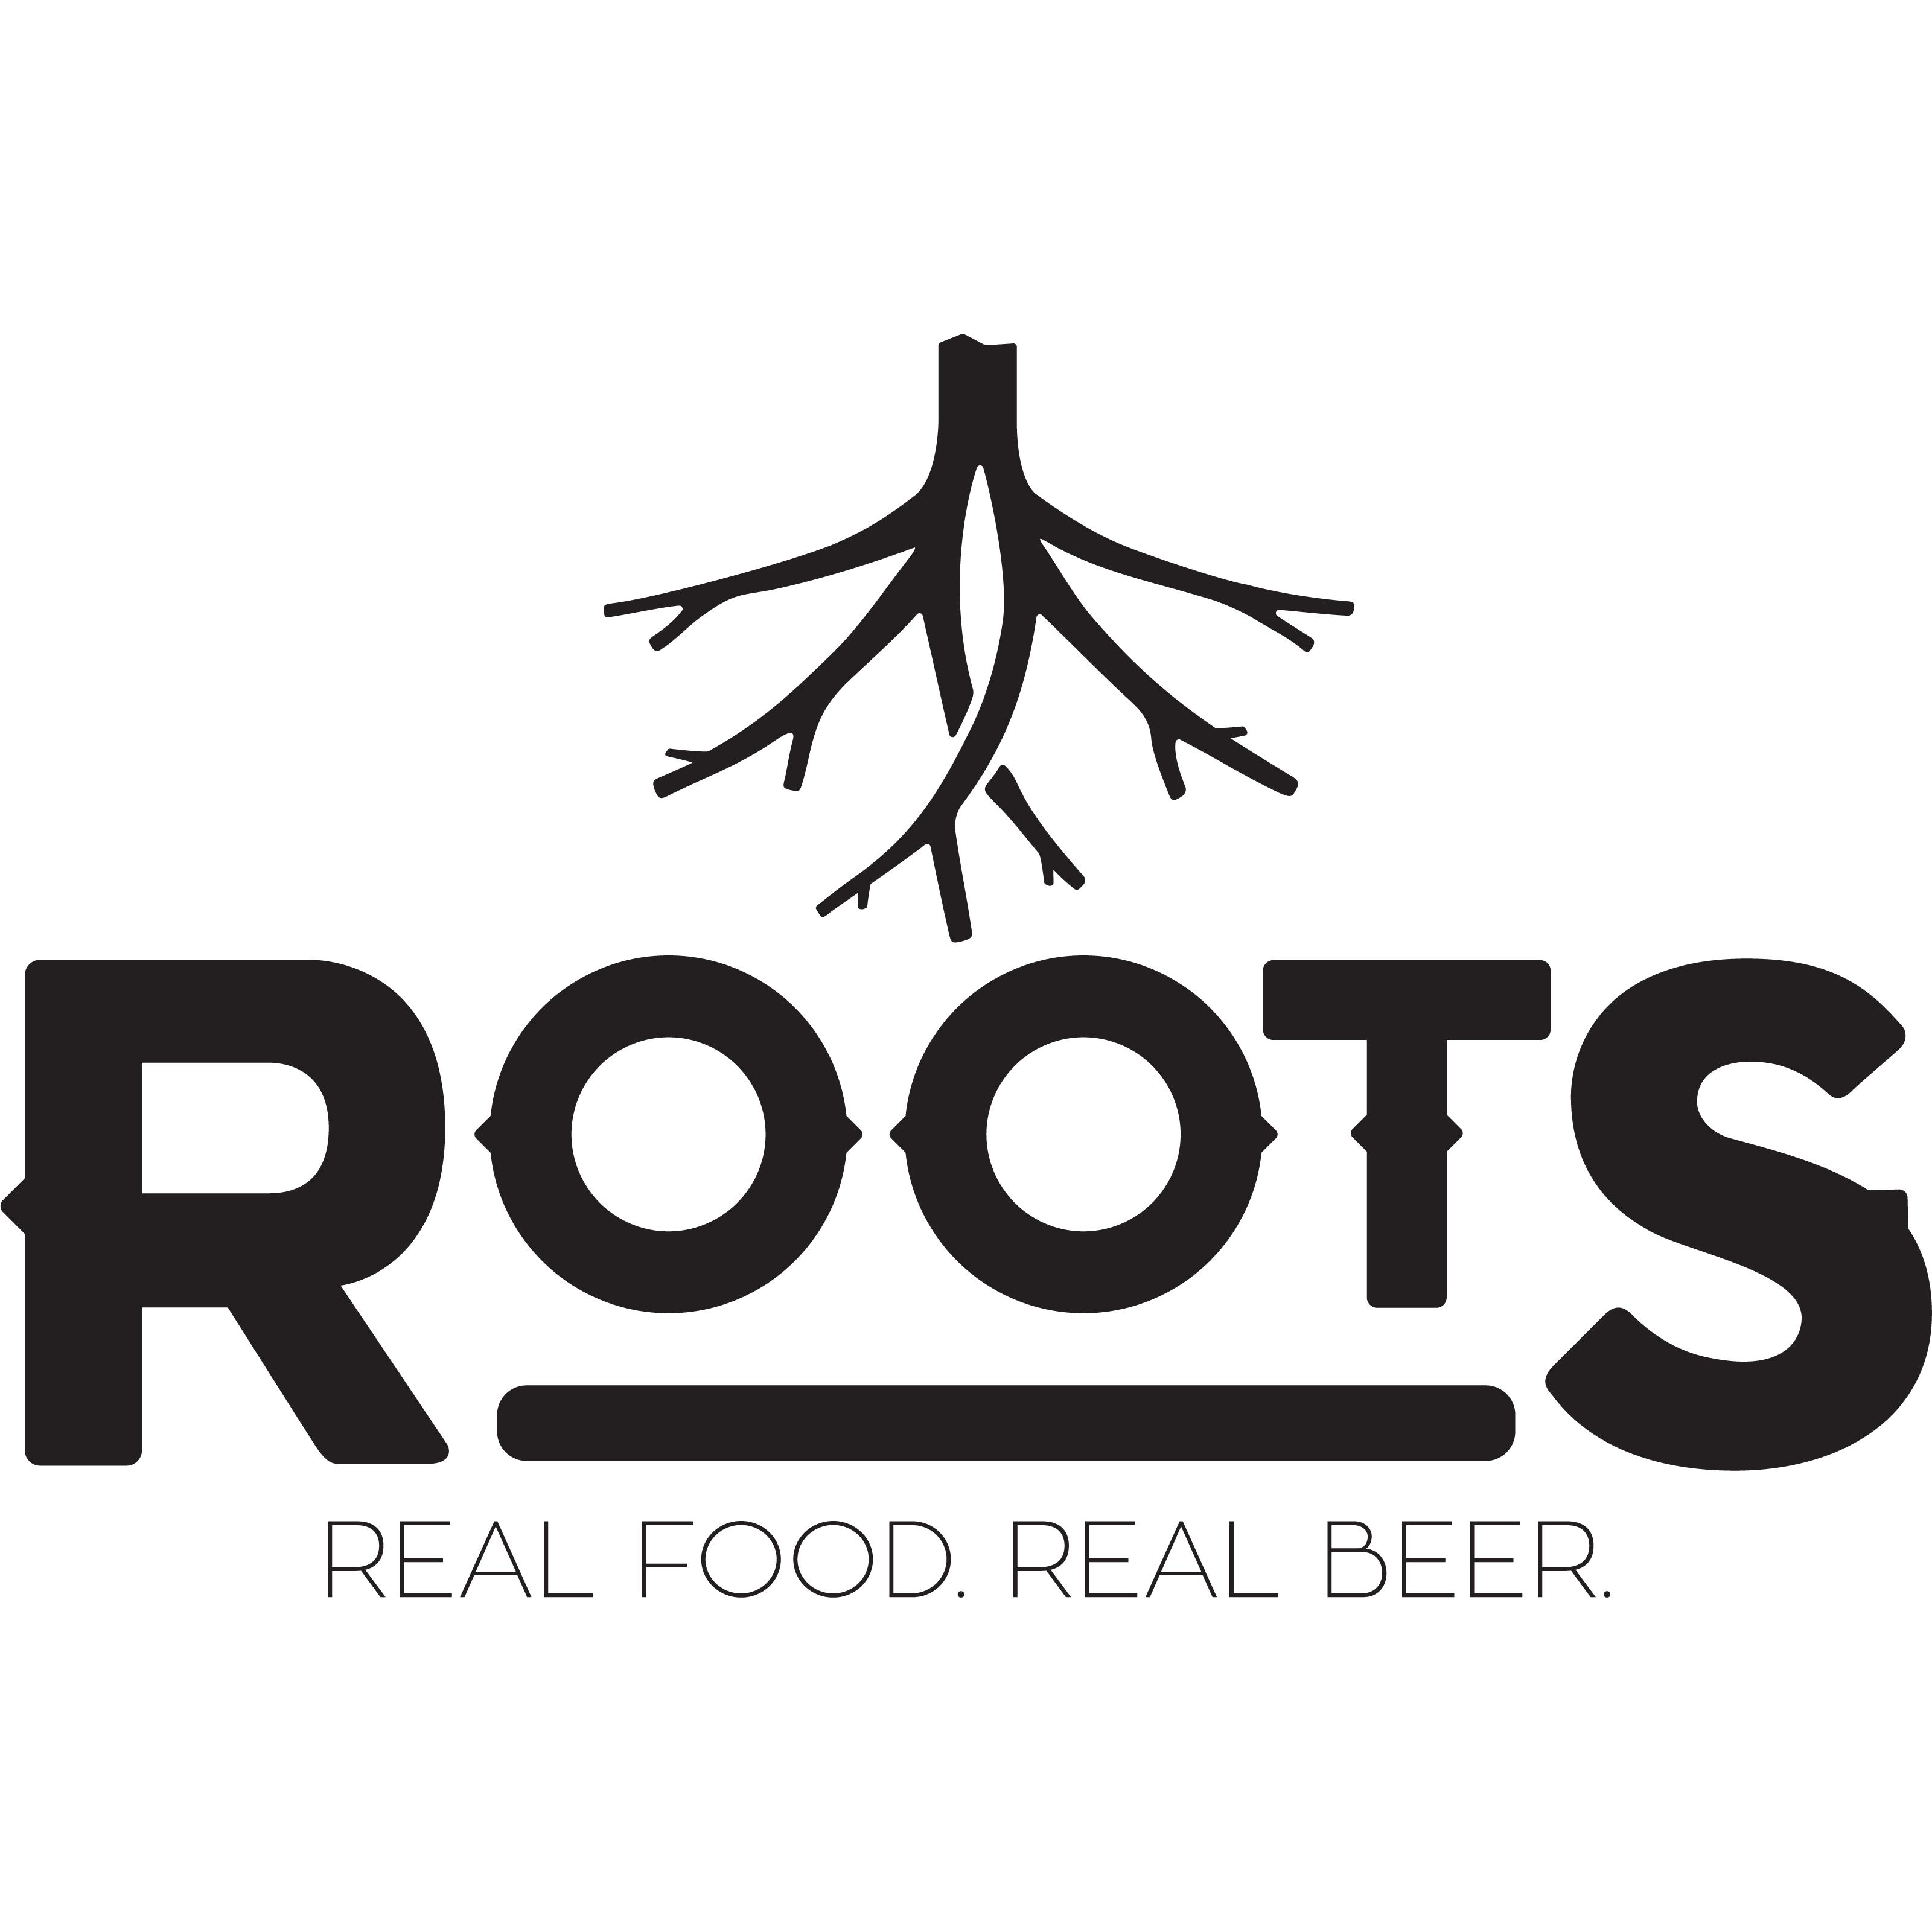 RootsRealFoodRealBeer